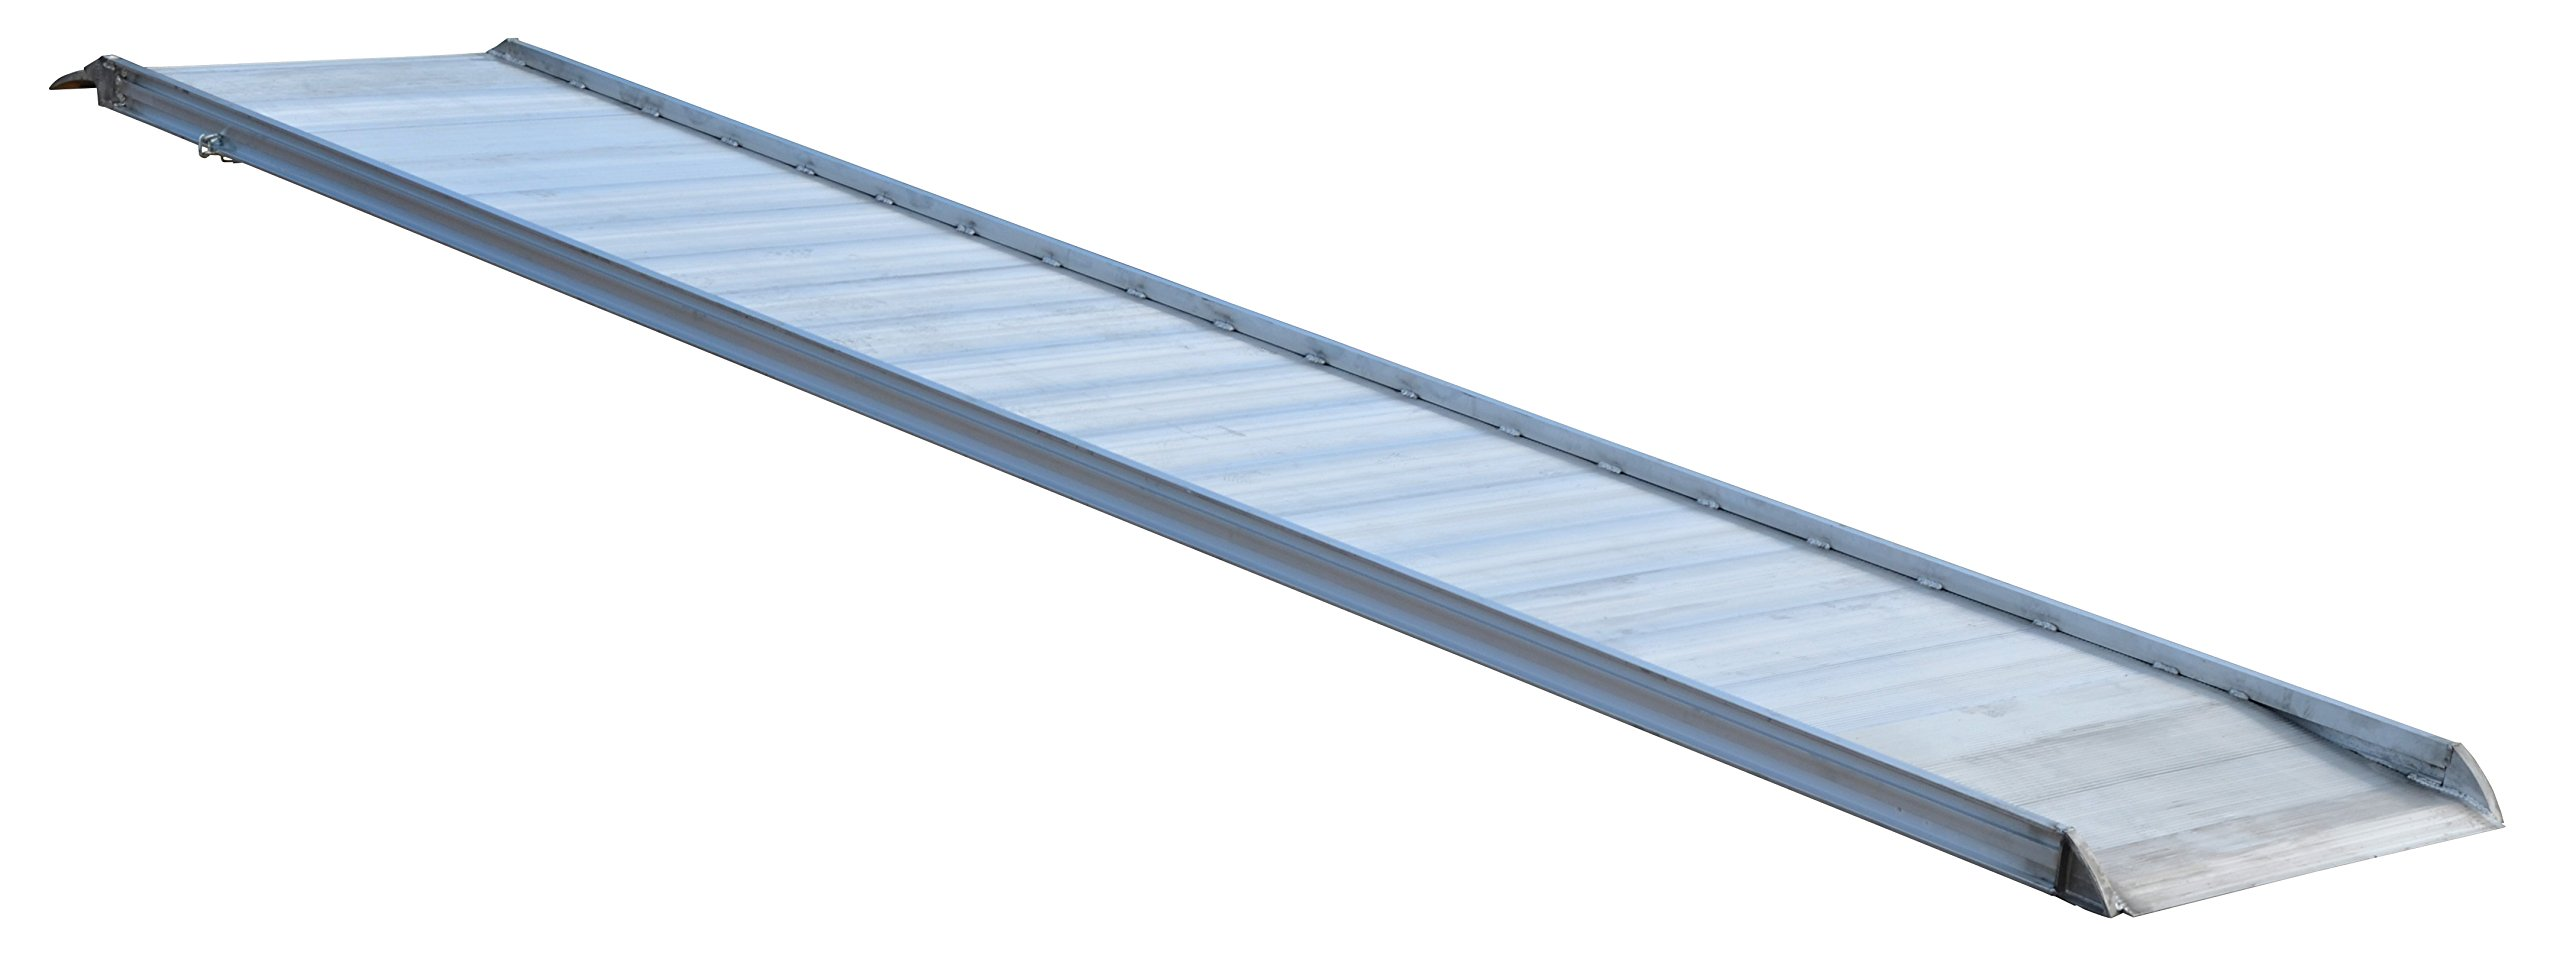 Vestil AWR-38-12A Aluminum Walk Ramp Overlap Style, 1900 lb, 144'' Length, 38'' Width, 4.75'' Height